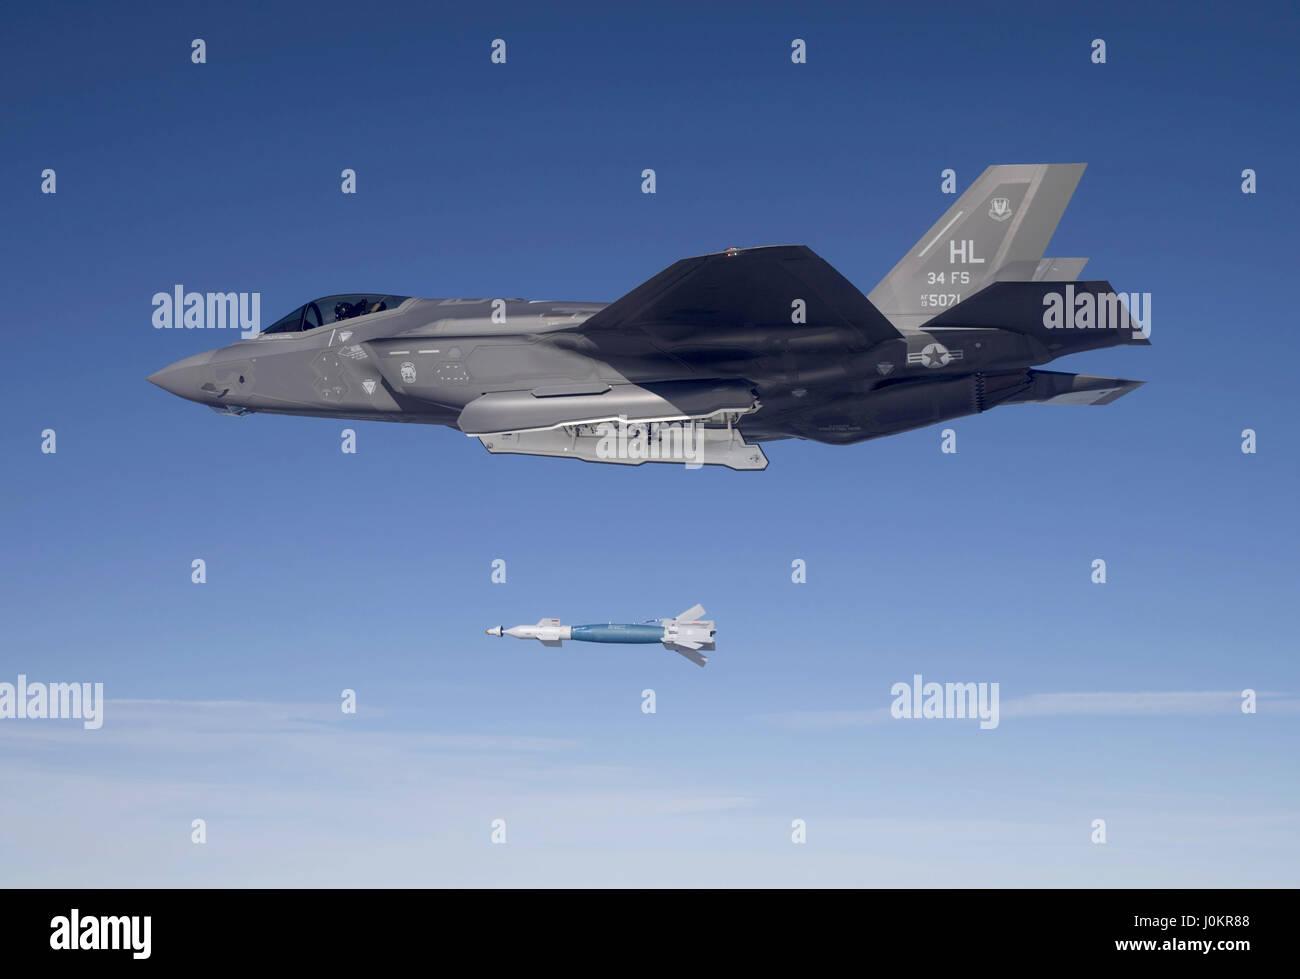 F-35A Lightning II drops a GBU-12 laser-guided bomb - Stock Image